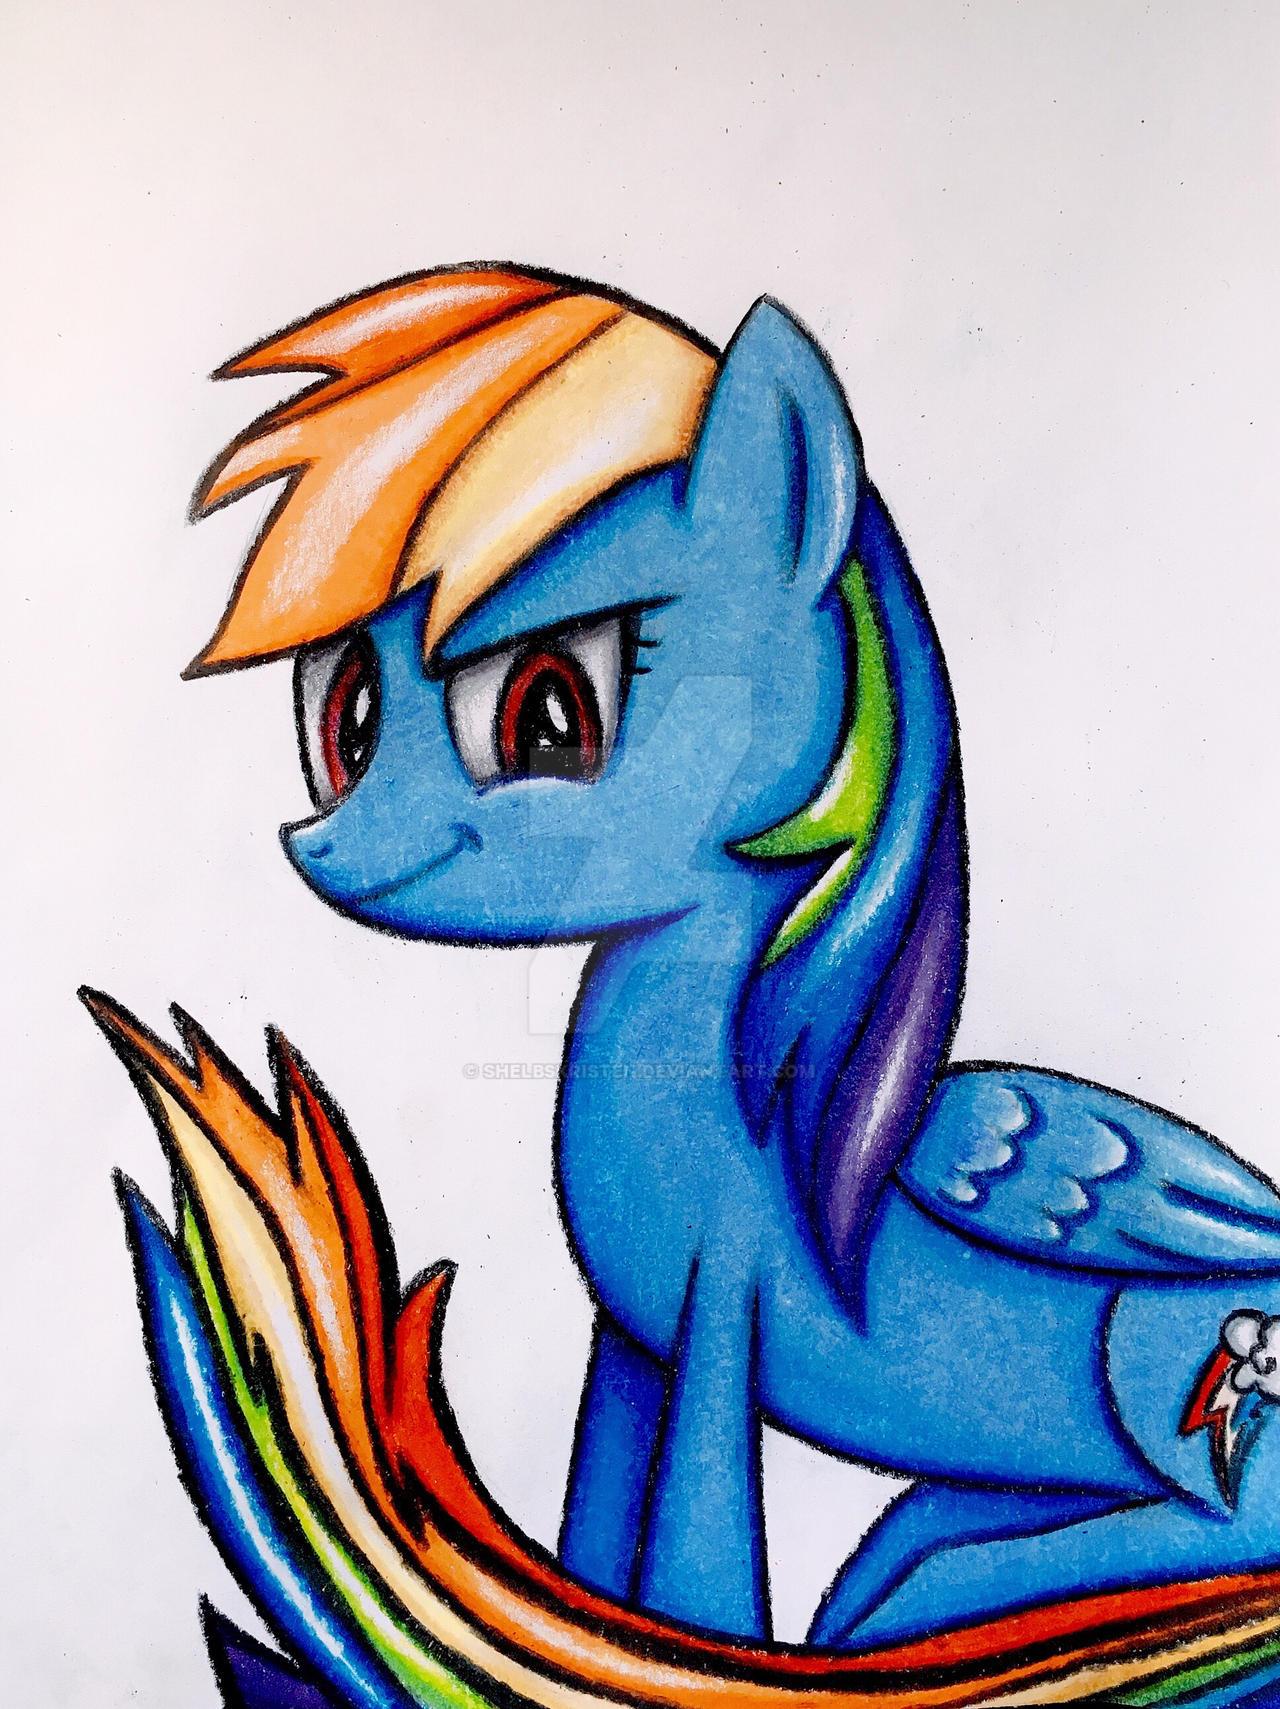 Rainbow Dash Coloring Pencil Drawing Mlp By Shelbskristen On Deviantart